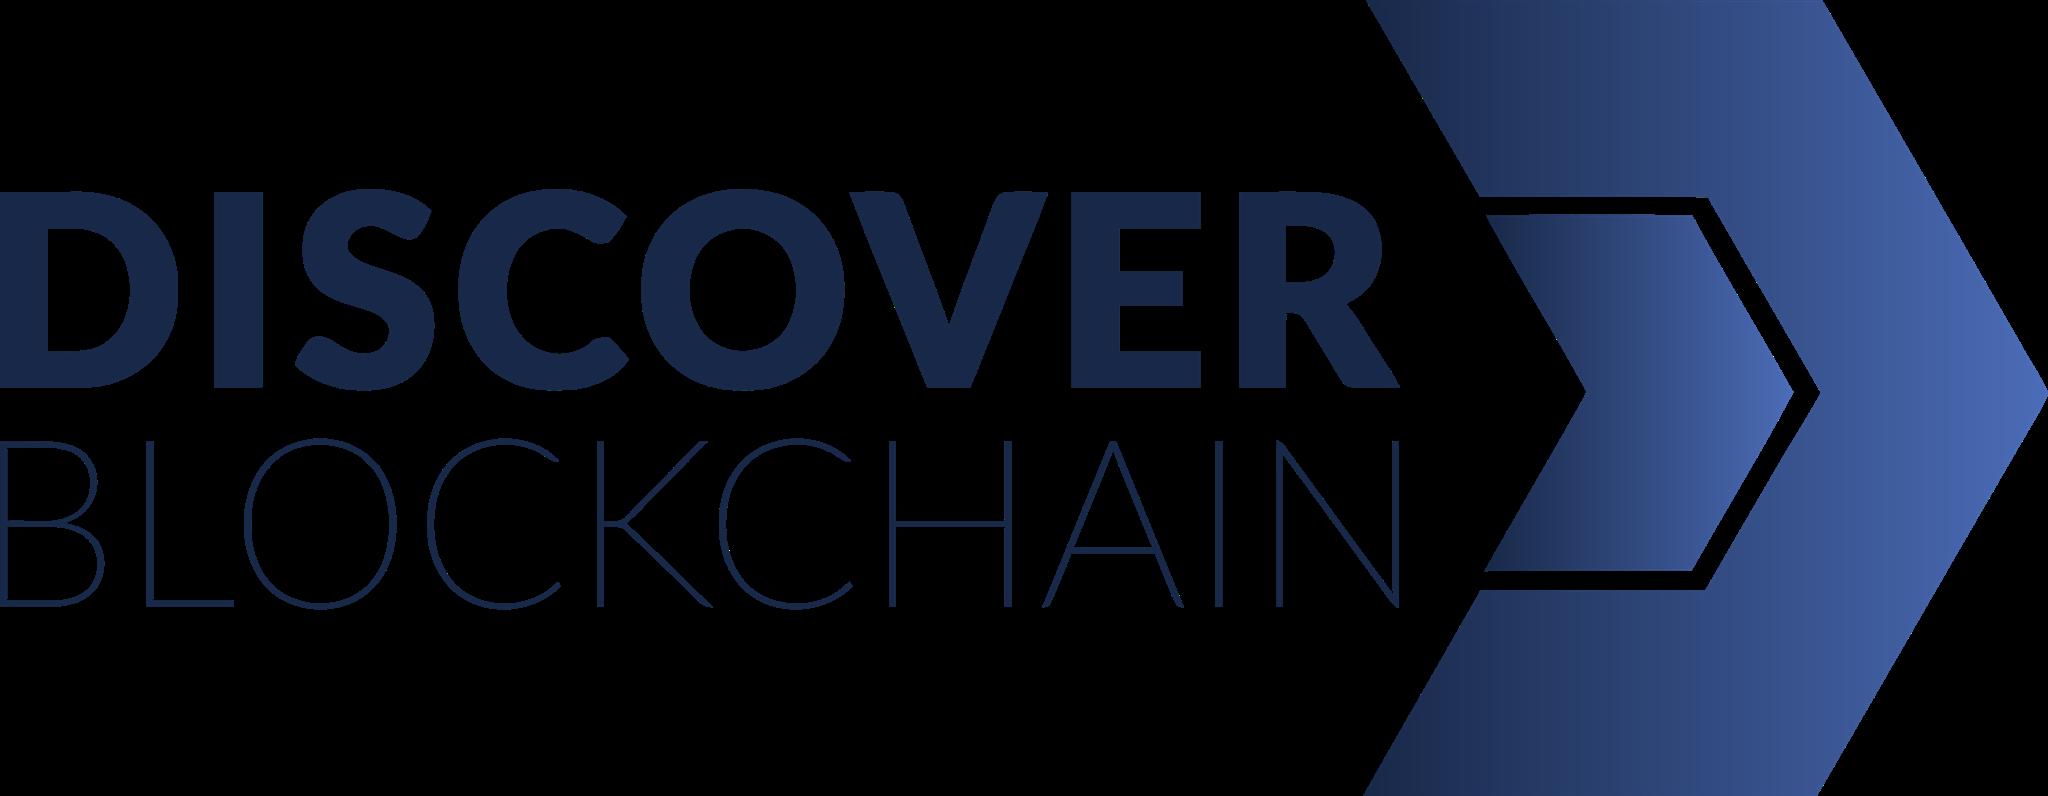 DiscoverBlockchain